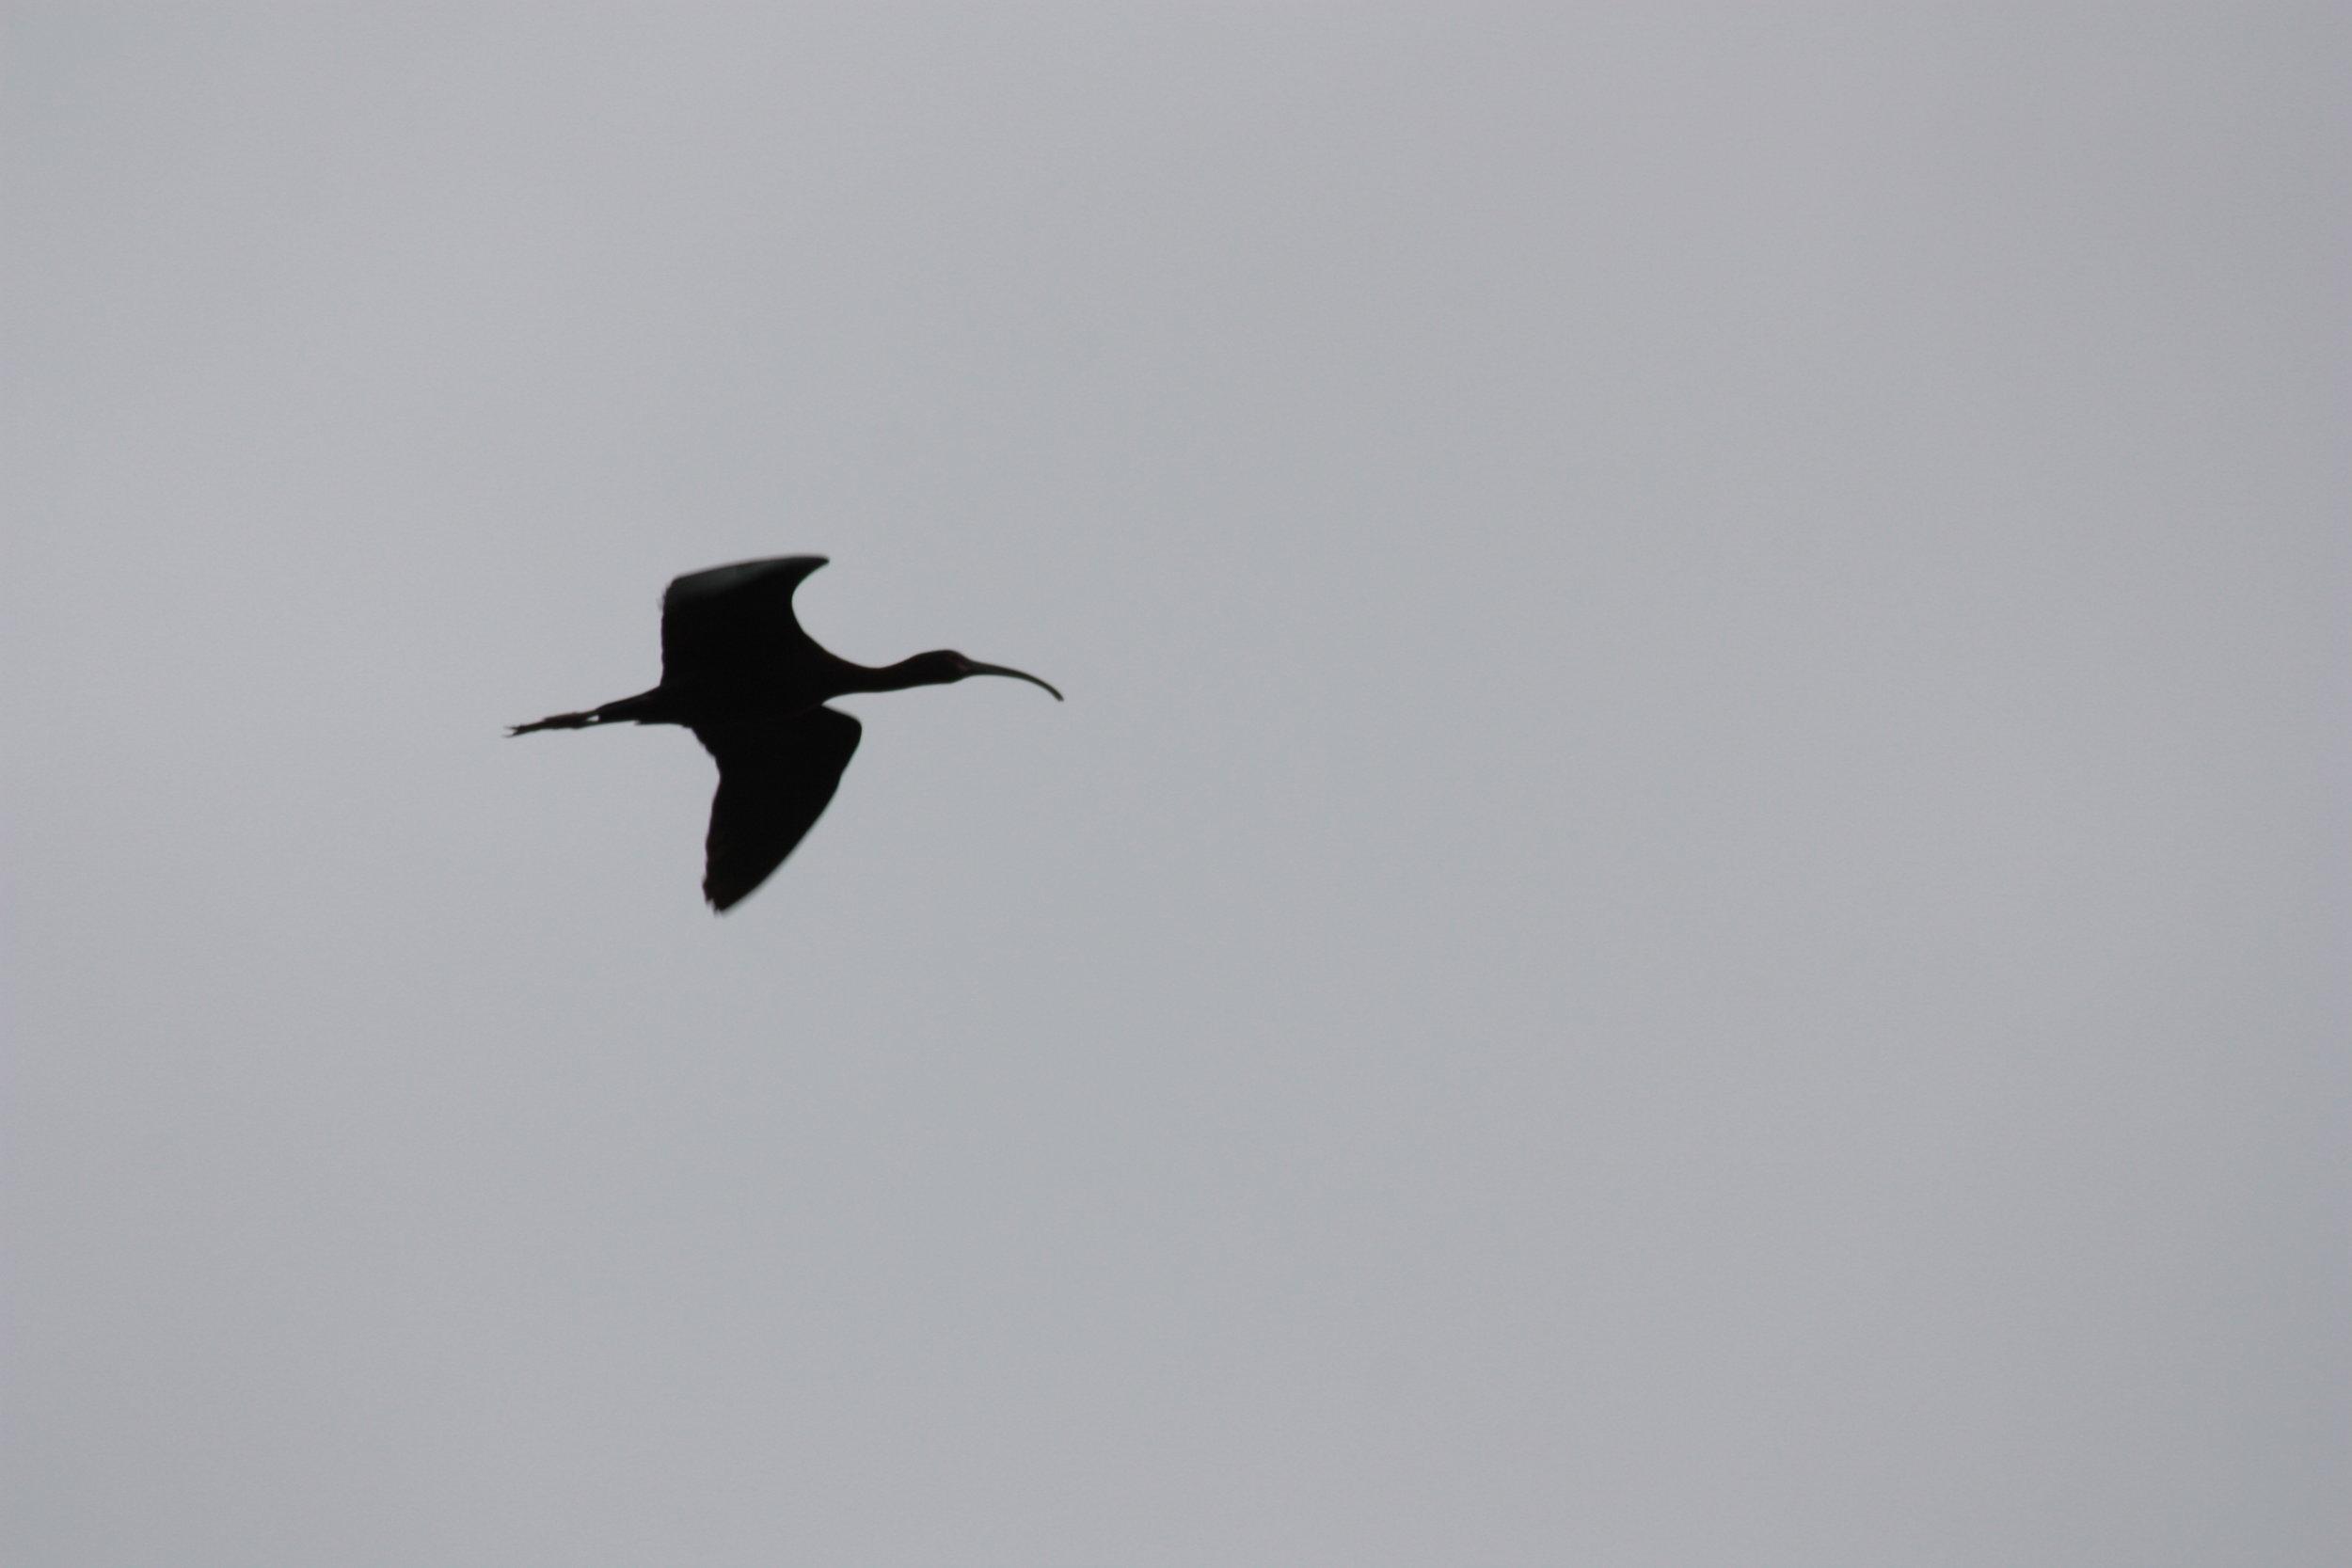 white-faced-ibis-plegadis-chihi_25785958430_o.jpg